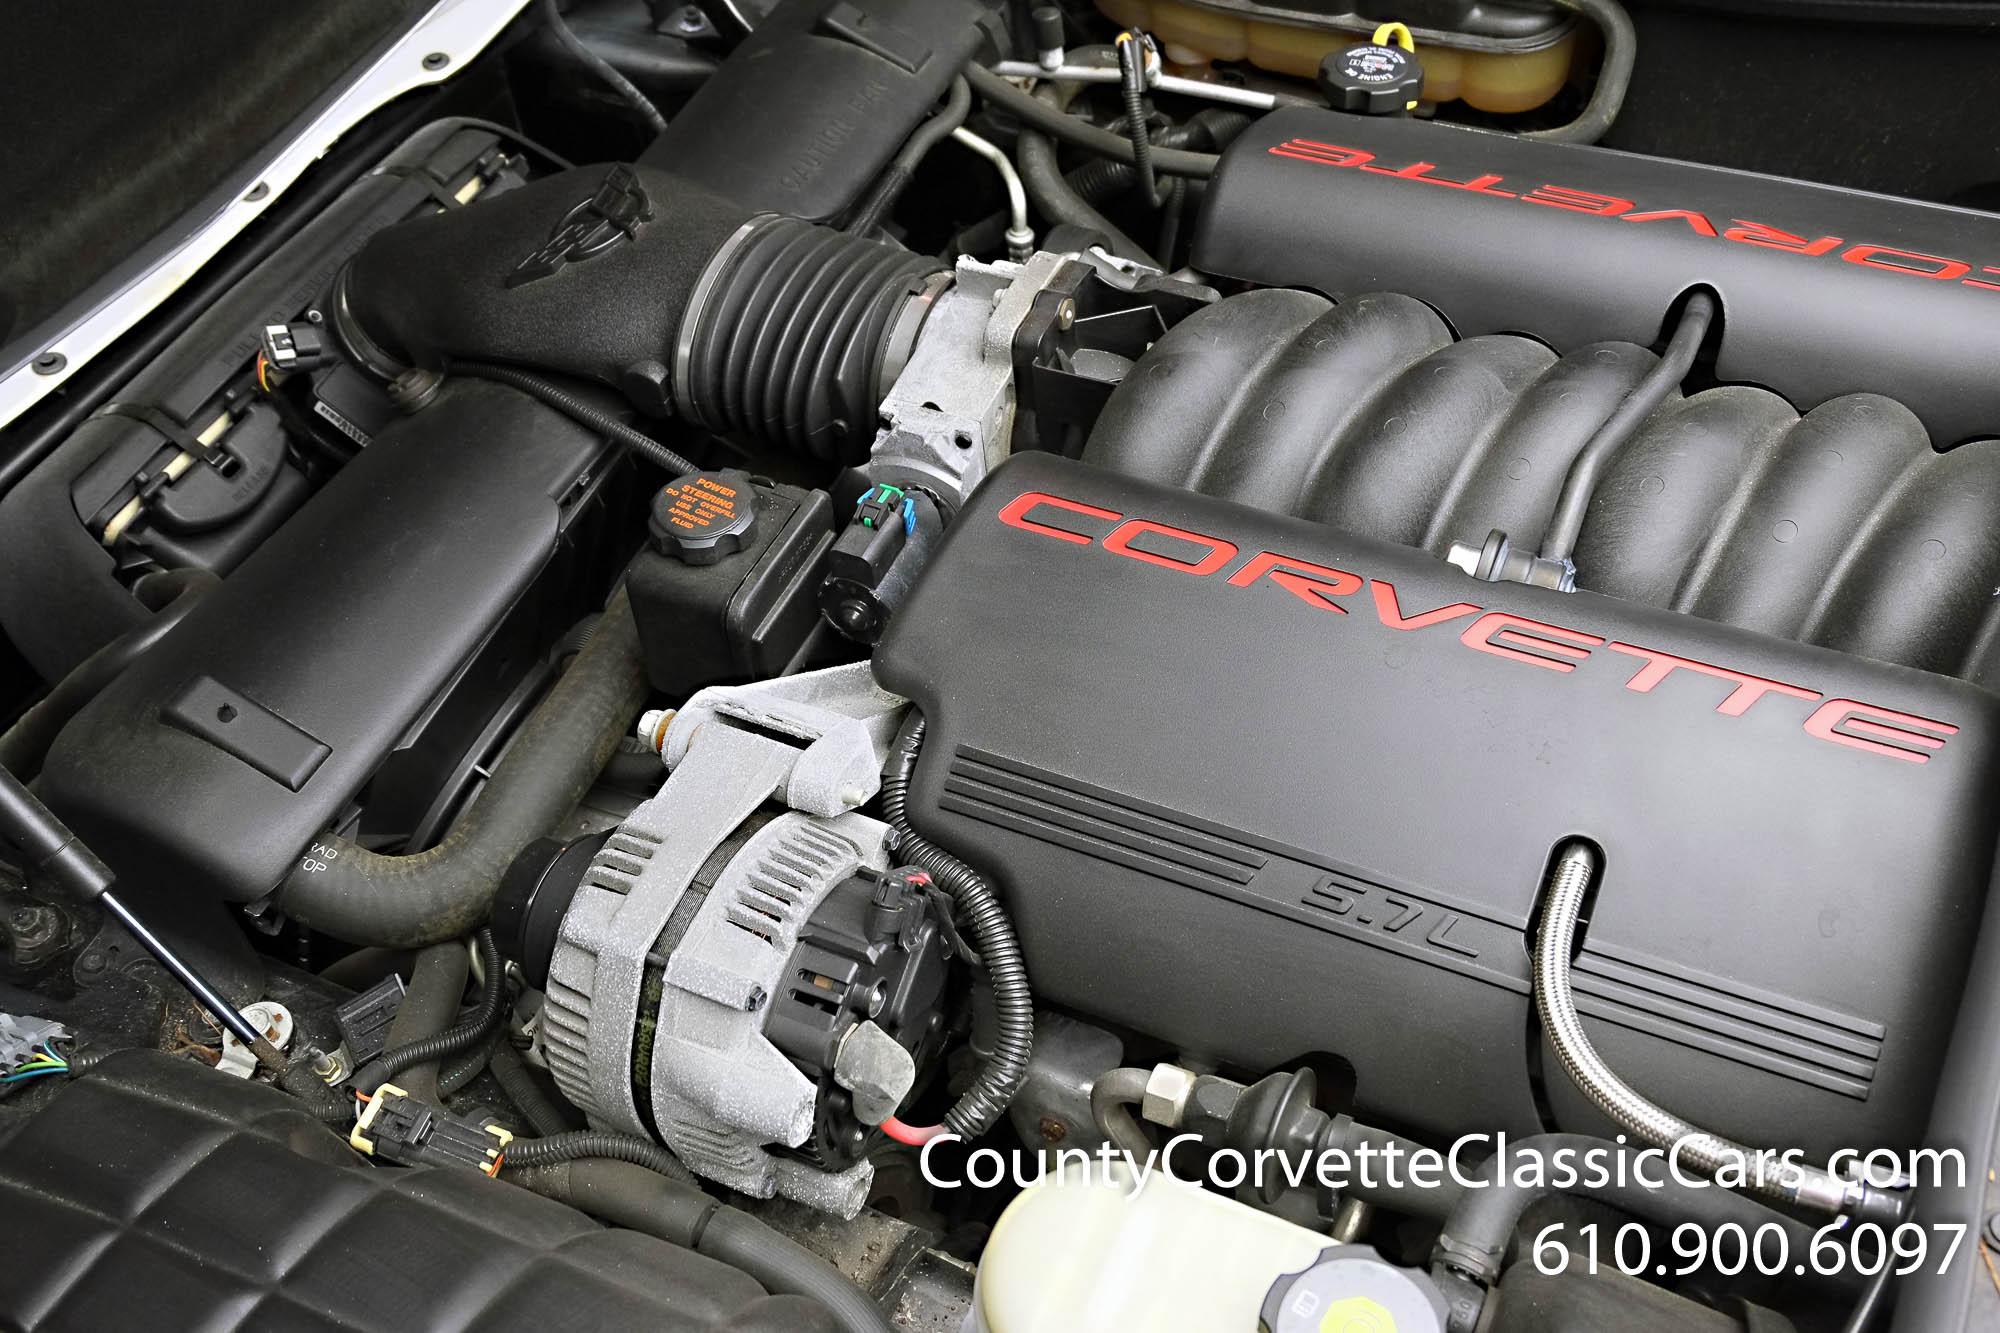 2002-Corvette-Coupe-15.jpg